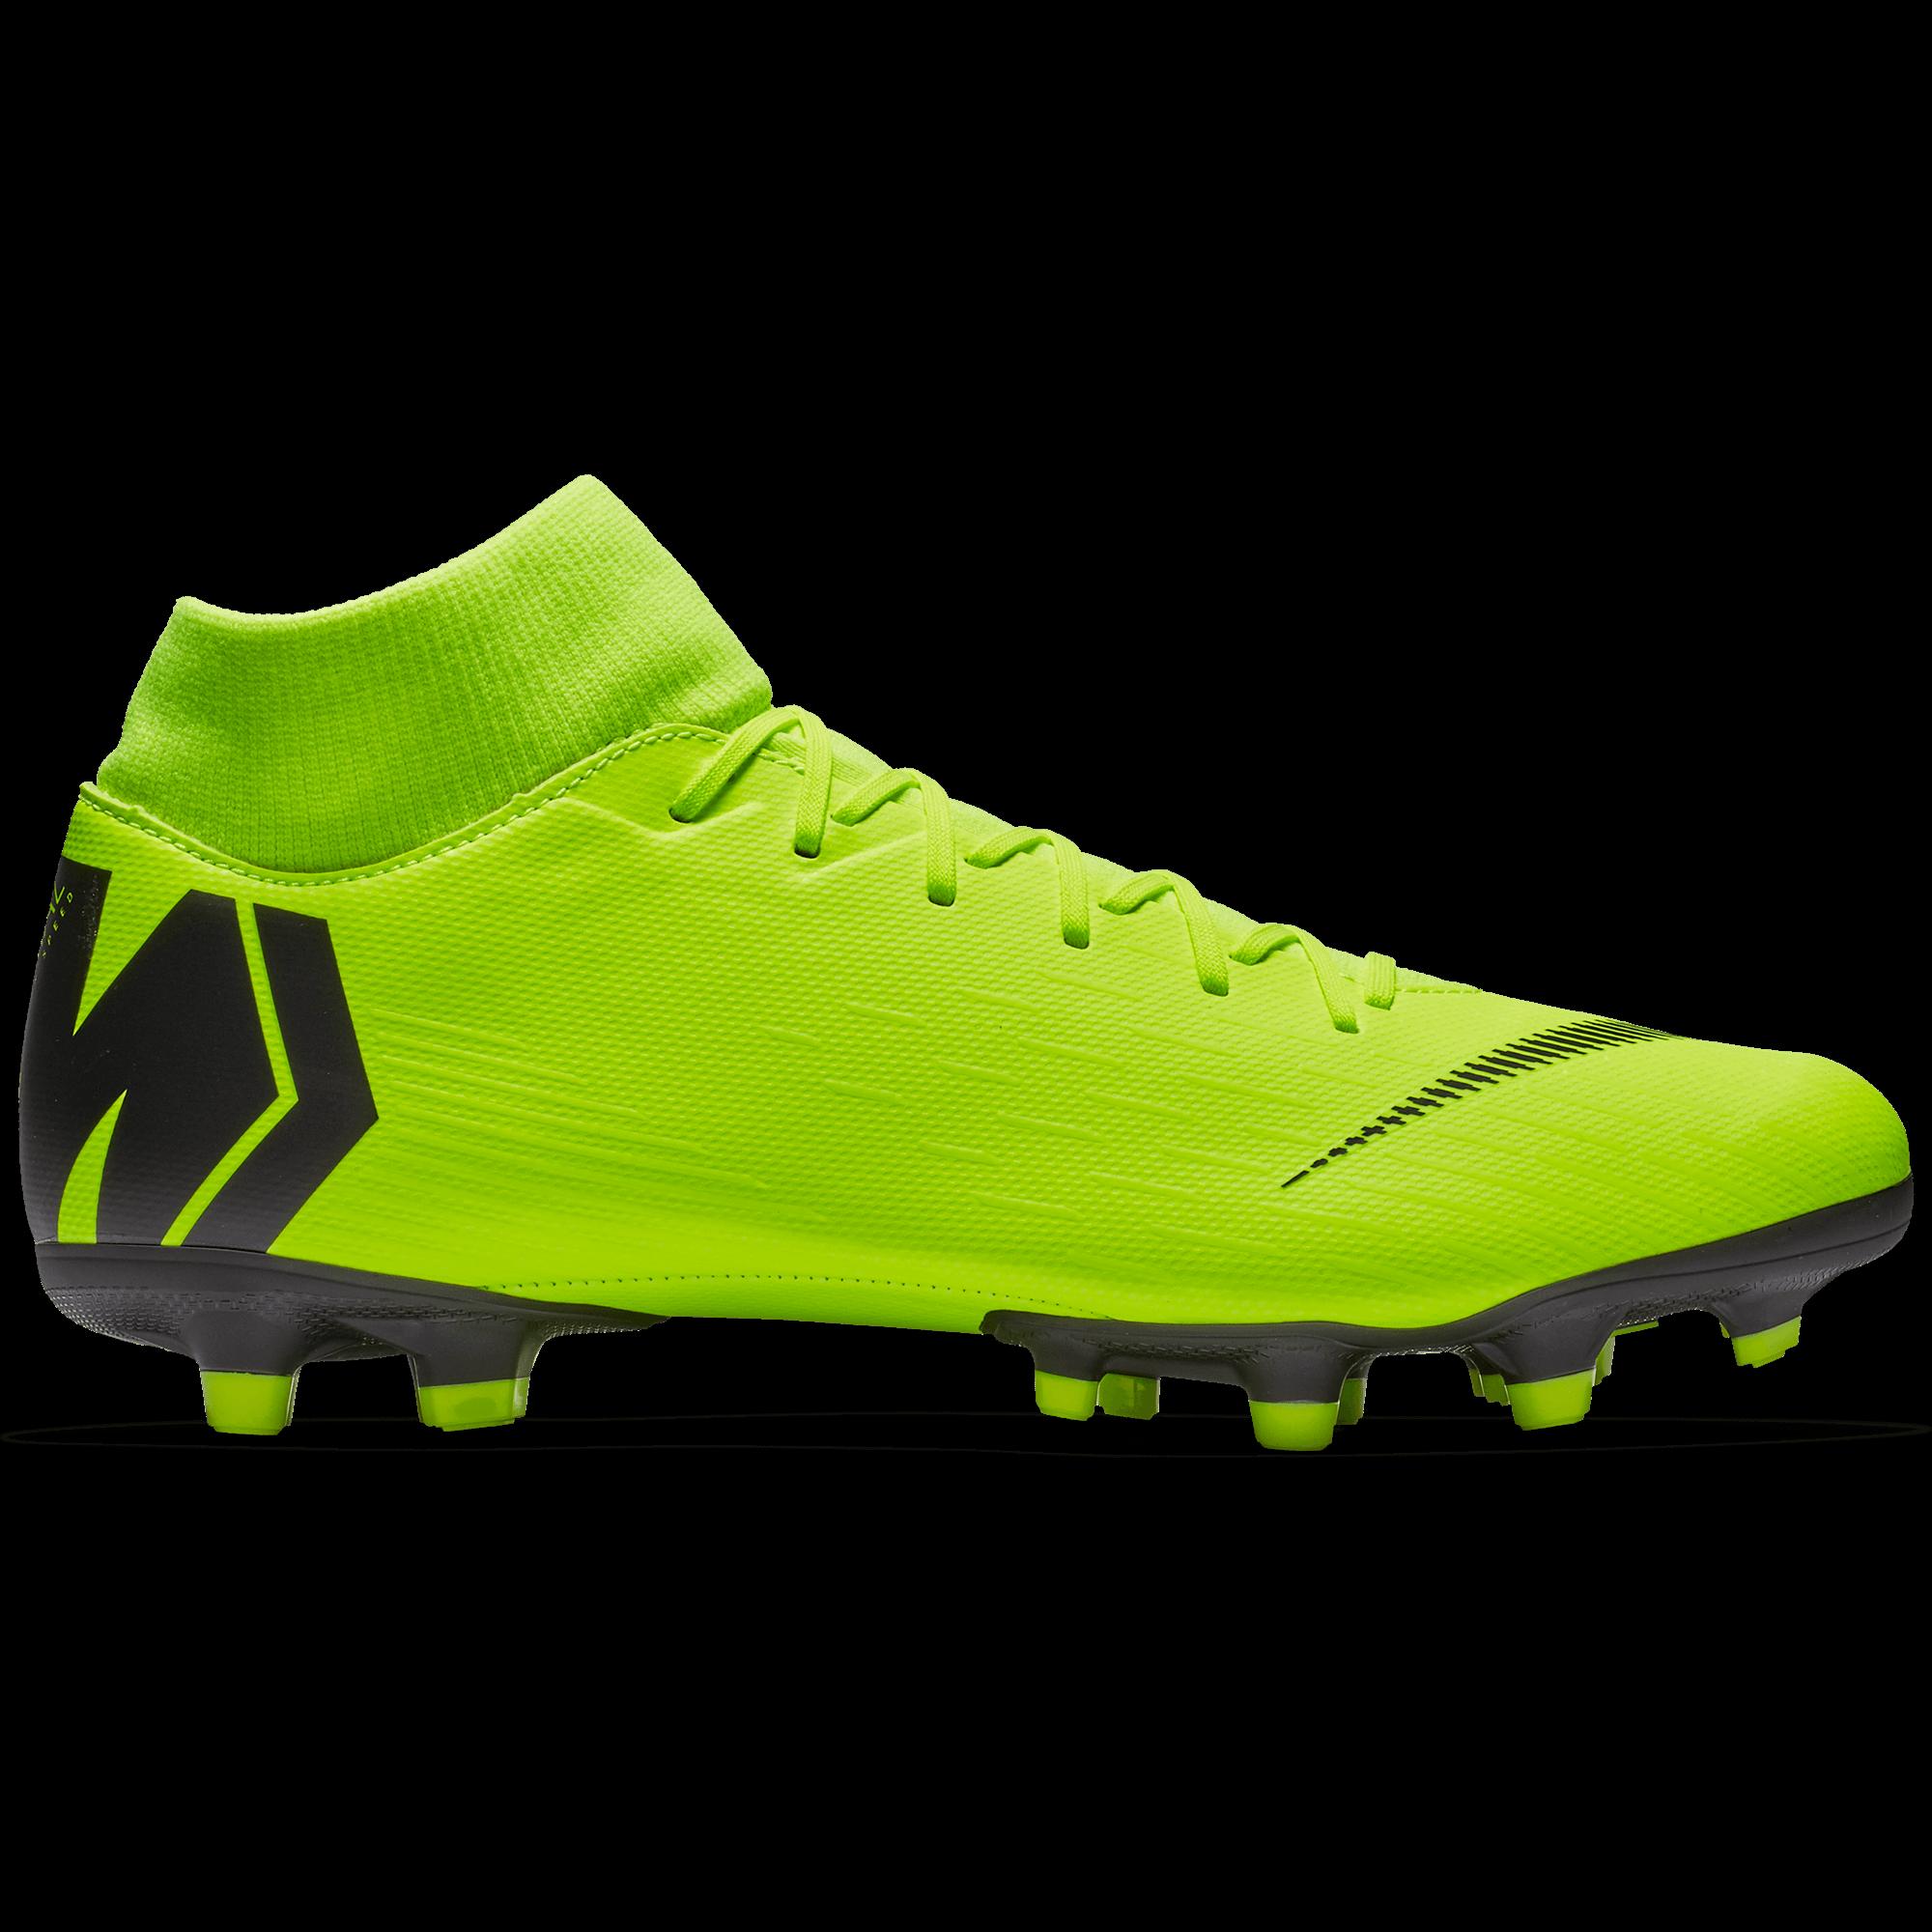 sale retailer 12c84 19d6d Nike Mercurial Superfly VI Academy MG Volt Black - Footballshop.nl